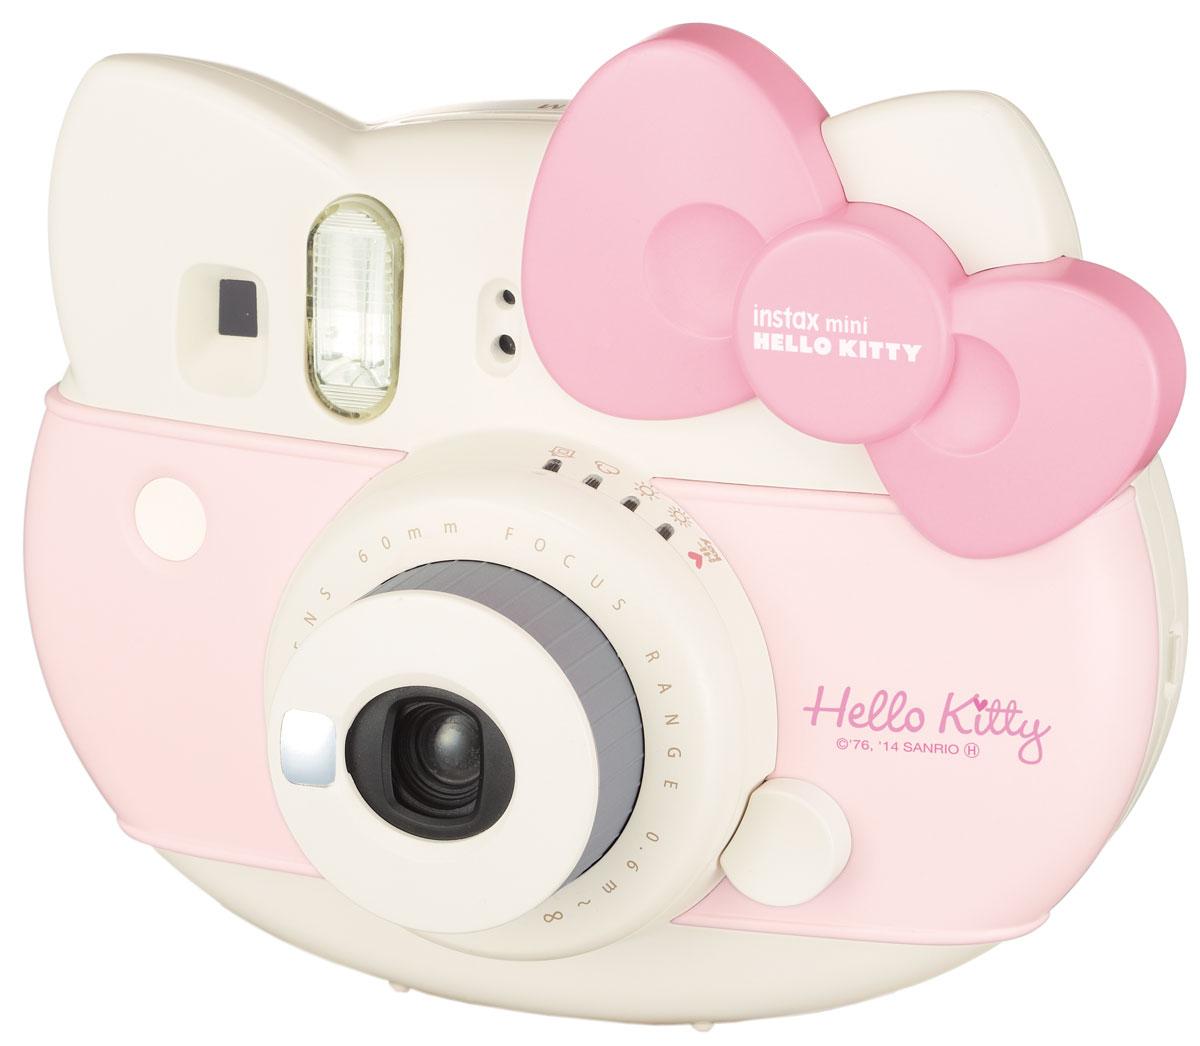 лучшая цена Fujifilm Instax Mini Hello Kitty, Pink фотоаппарат моментальной печати